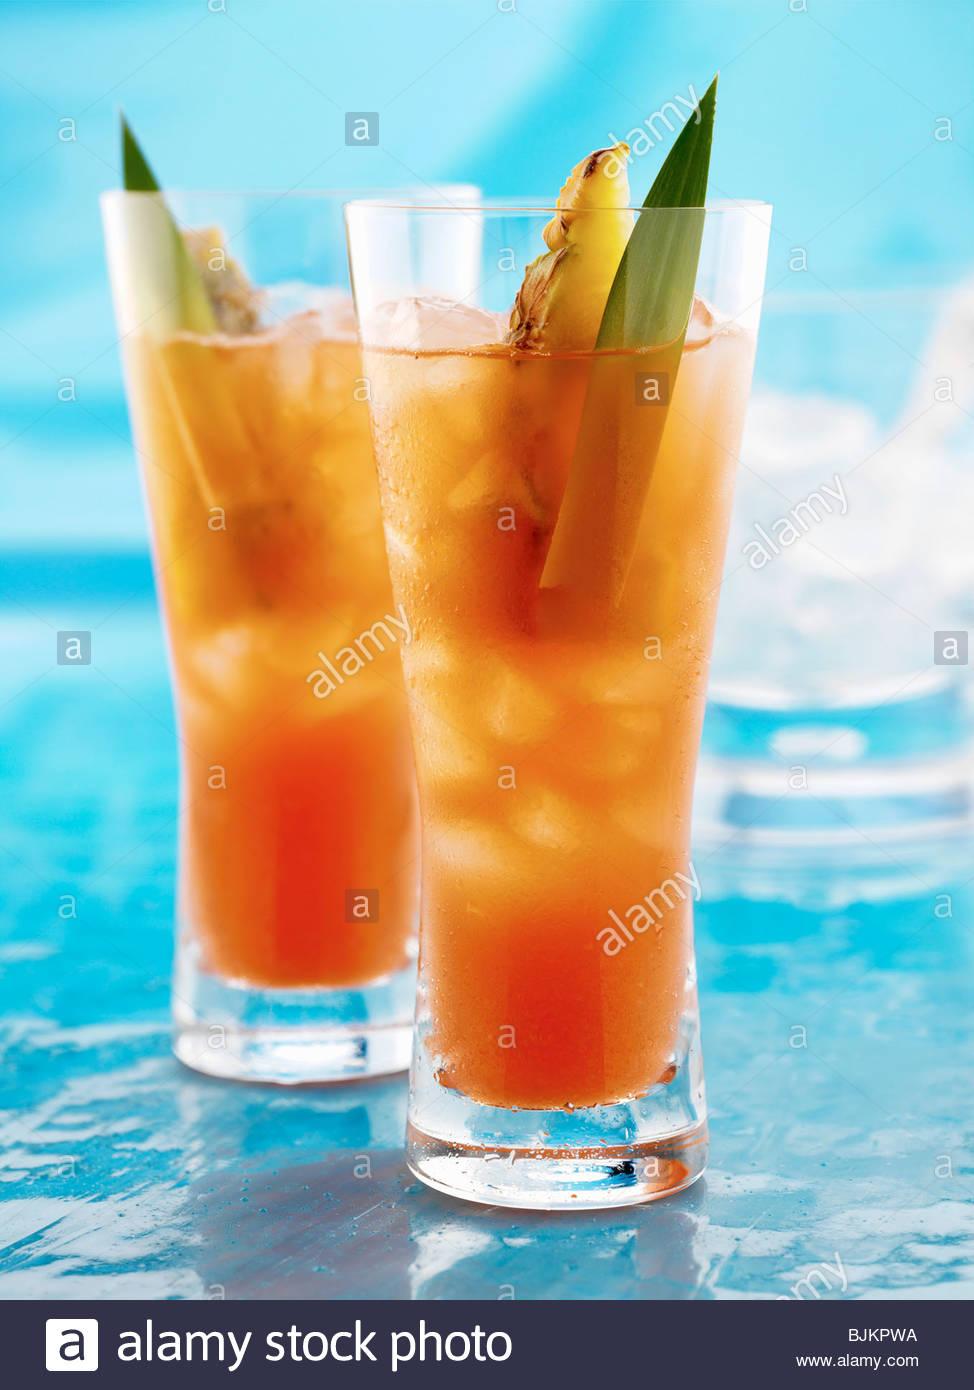 Irish Seduction (Cocktail made with vokda, whiskey & pineapple) - Stock Image